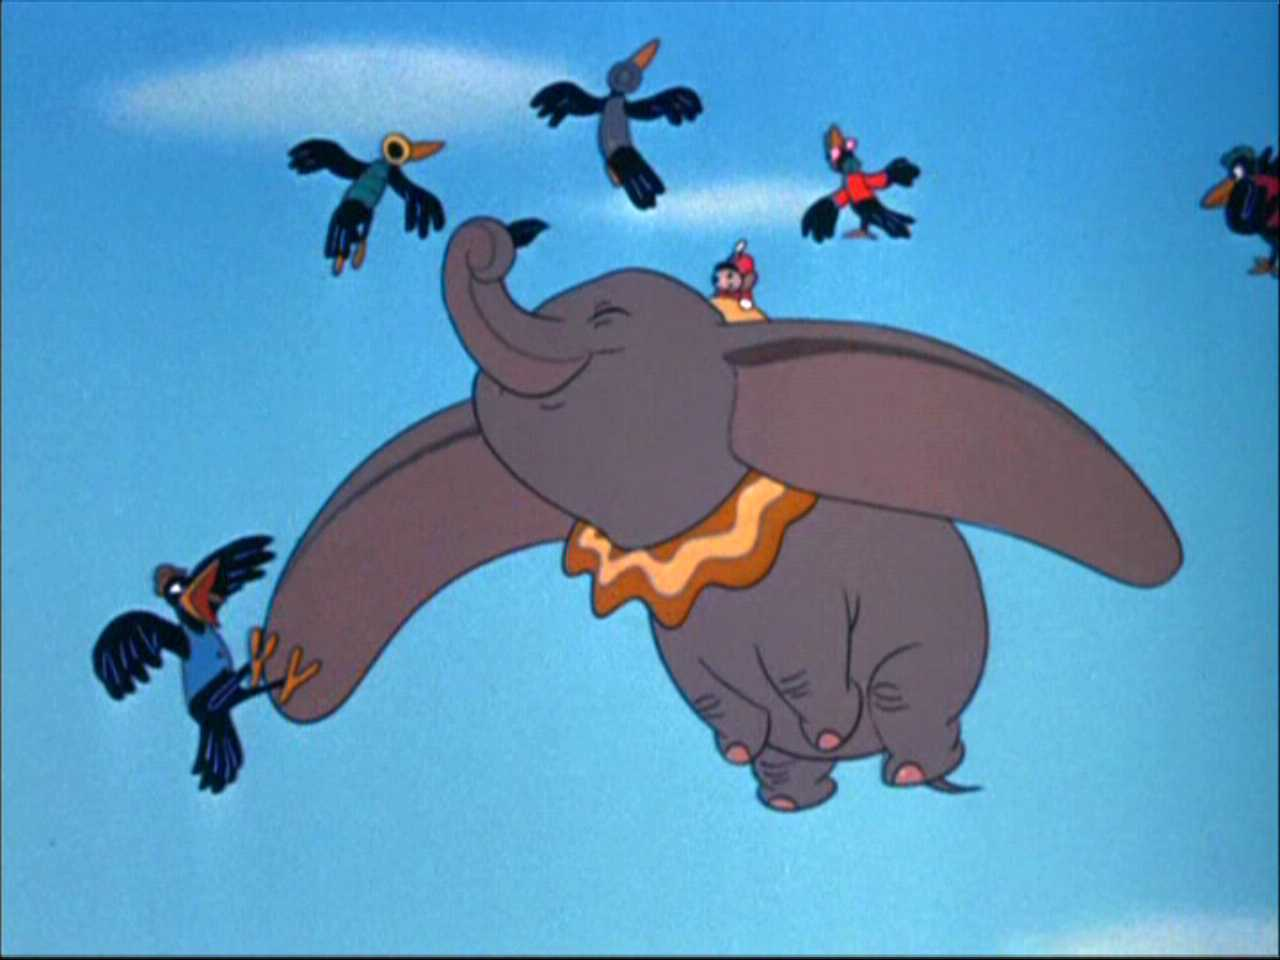 Dumbo Classic Disney Image 4613878 Fanpop